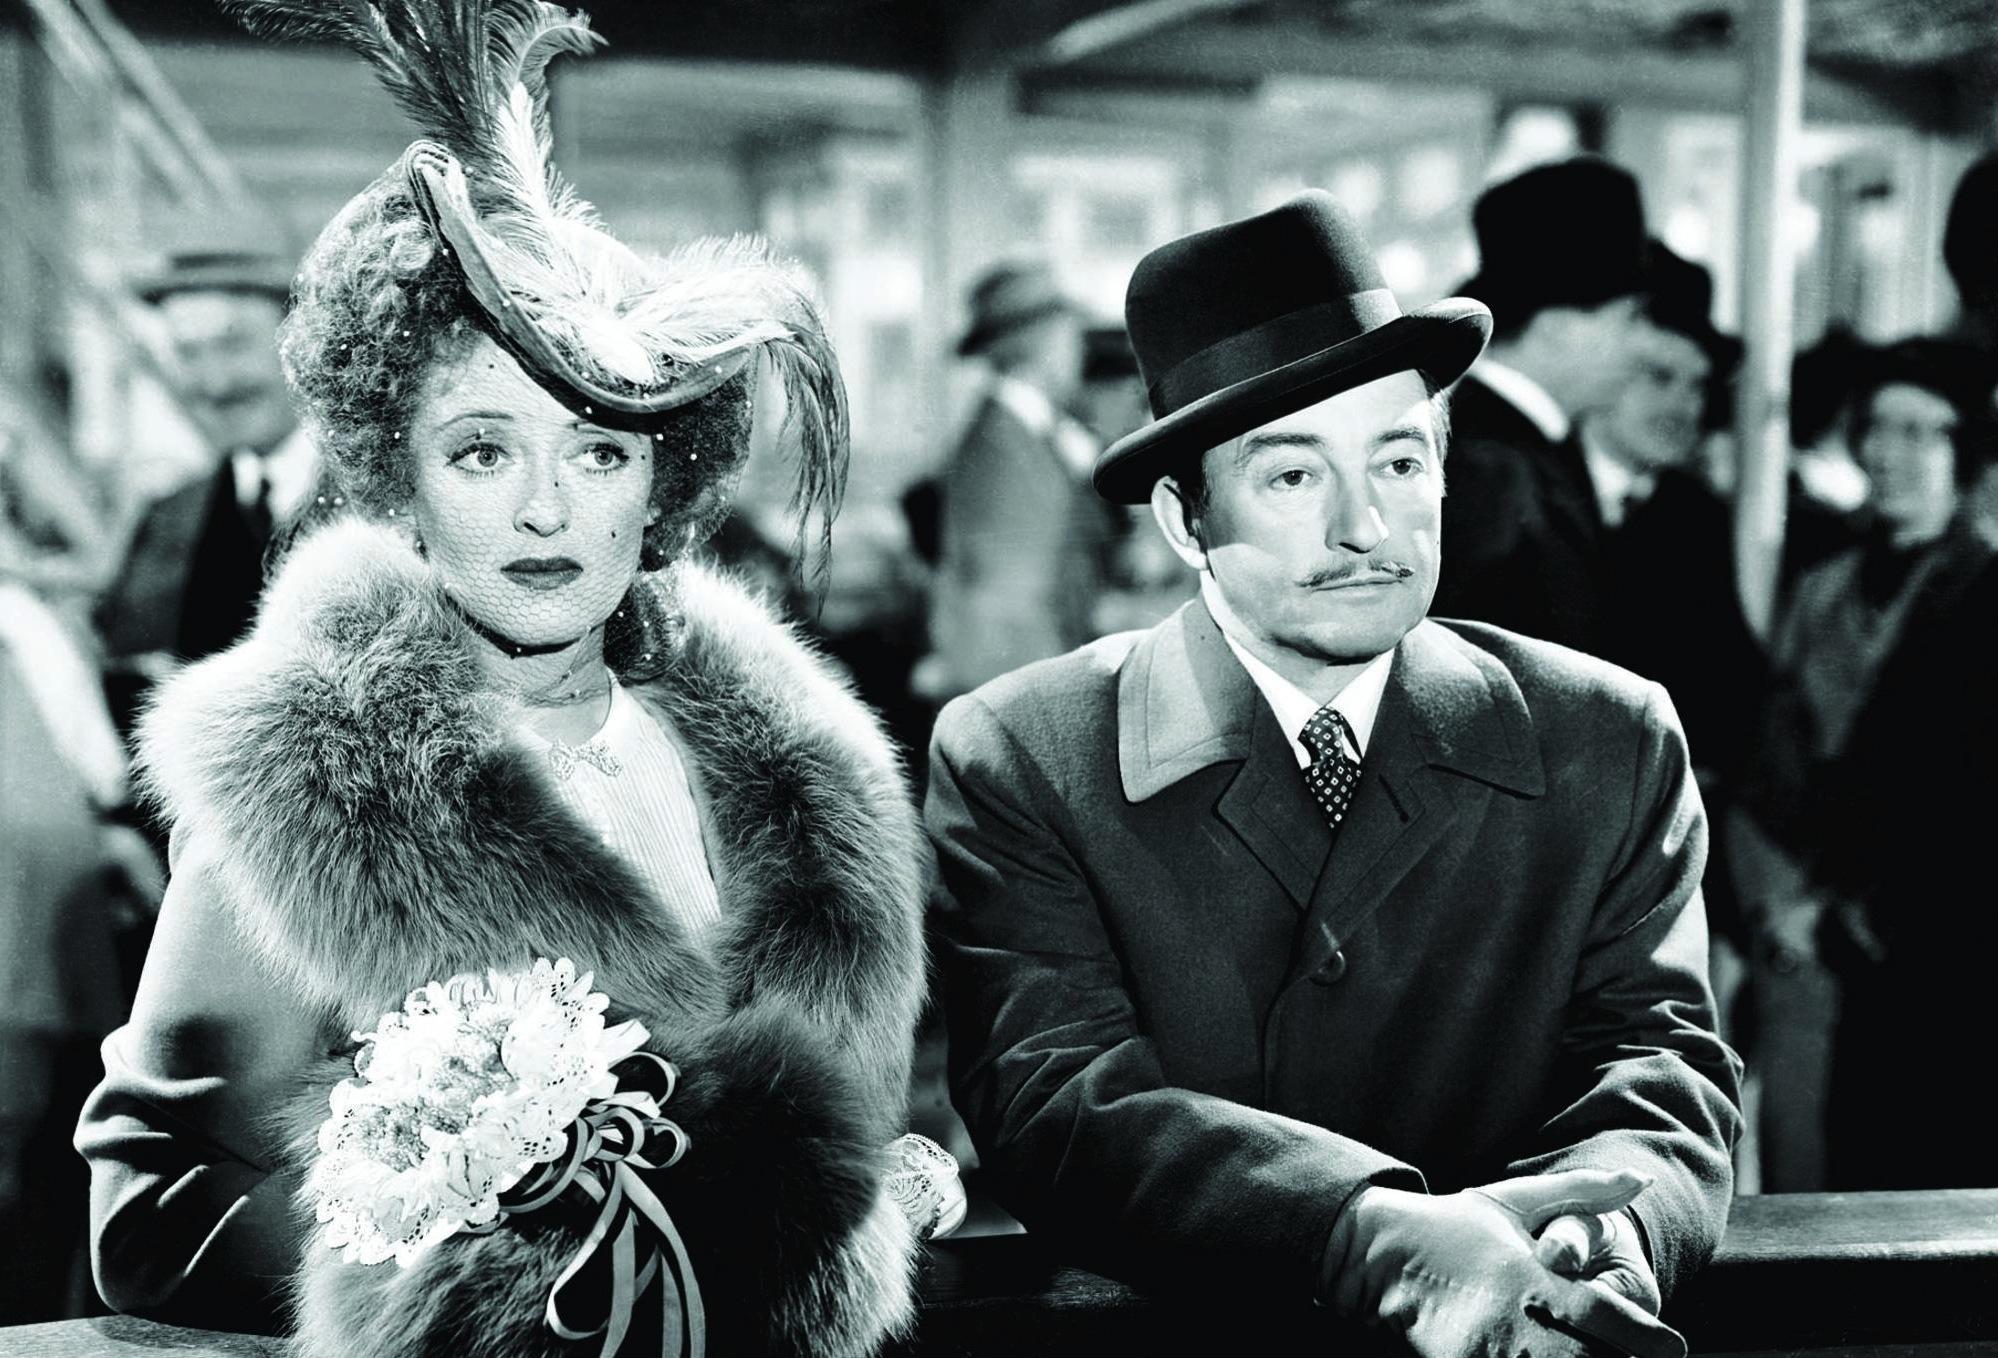 Bette Davis and Claude Rains in Mr. Skeffington (1944)